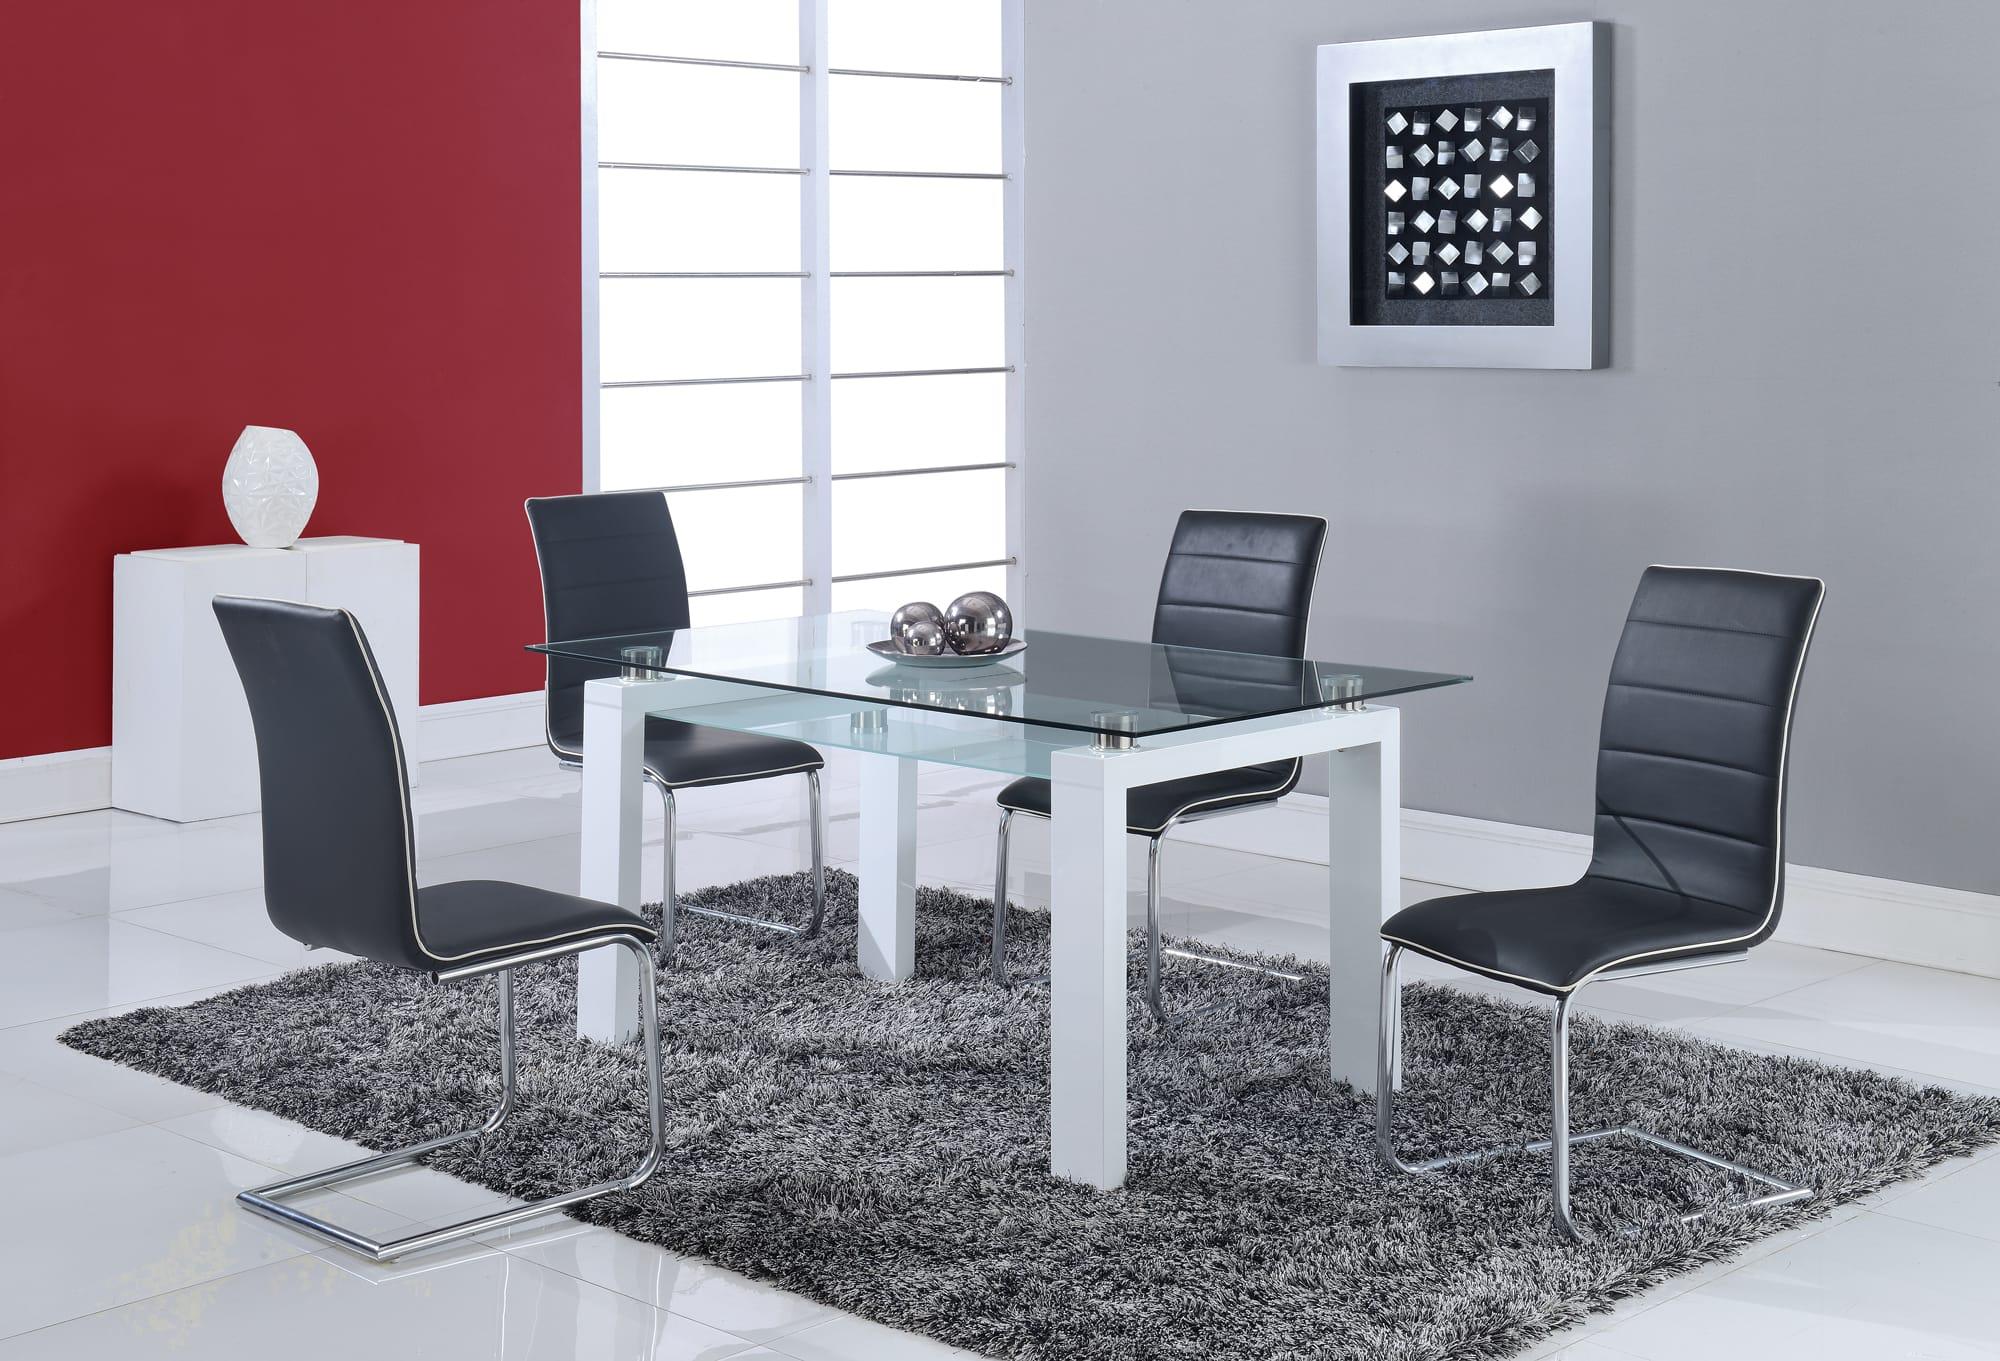 dining table d648dt white by global furniture. Black Bedroom Furniture Sets. Home Design Ideas